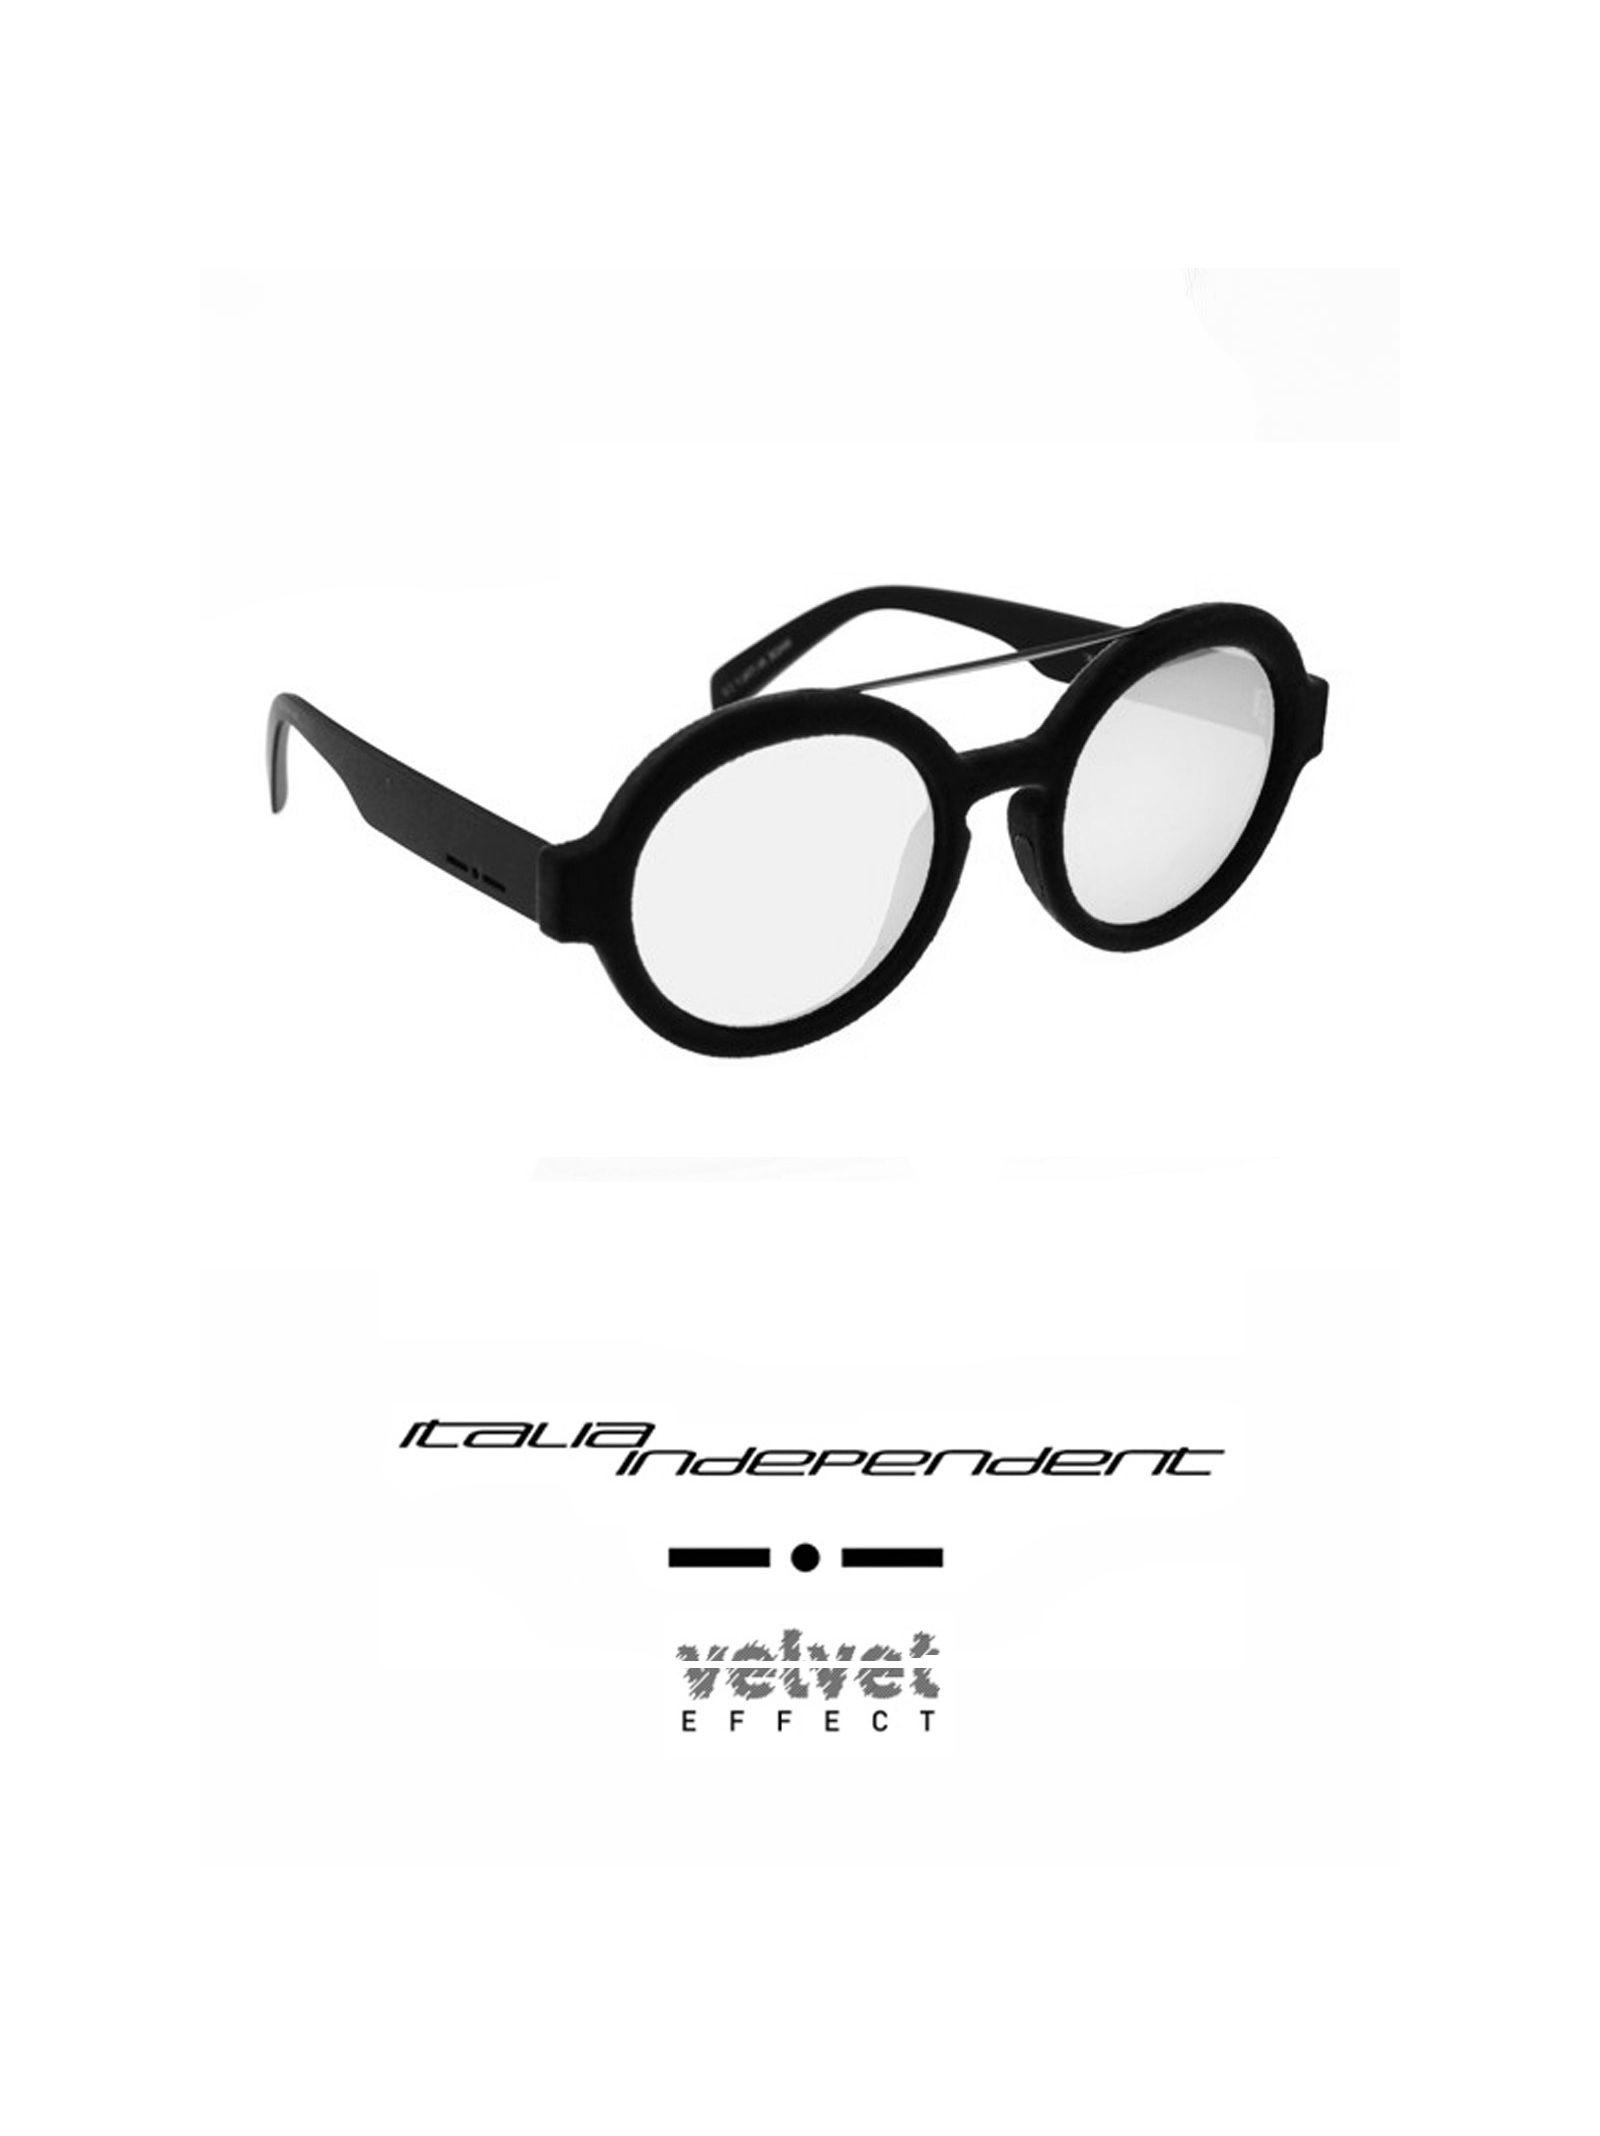 I-velvet Sunglasses - Italia Independent - Blossom